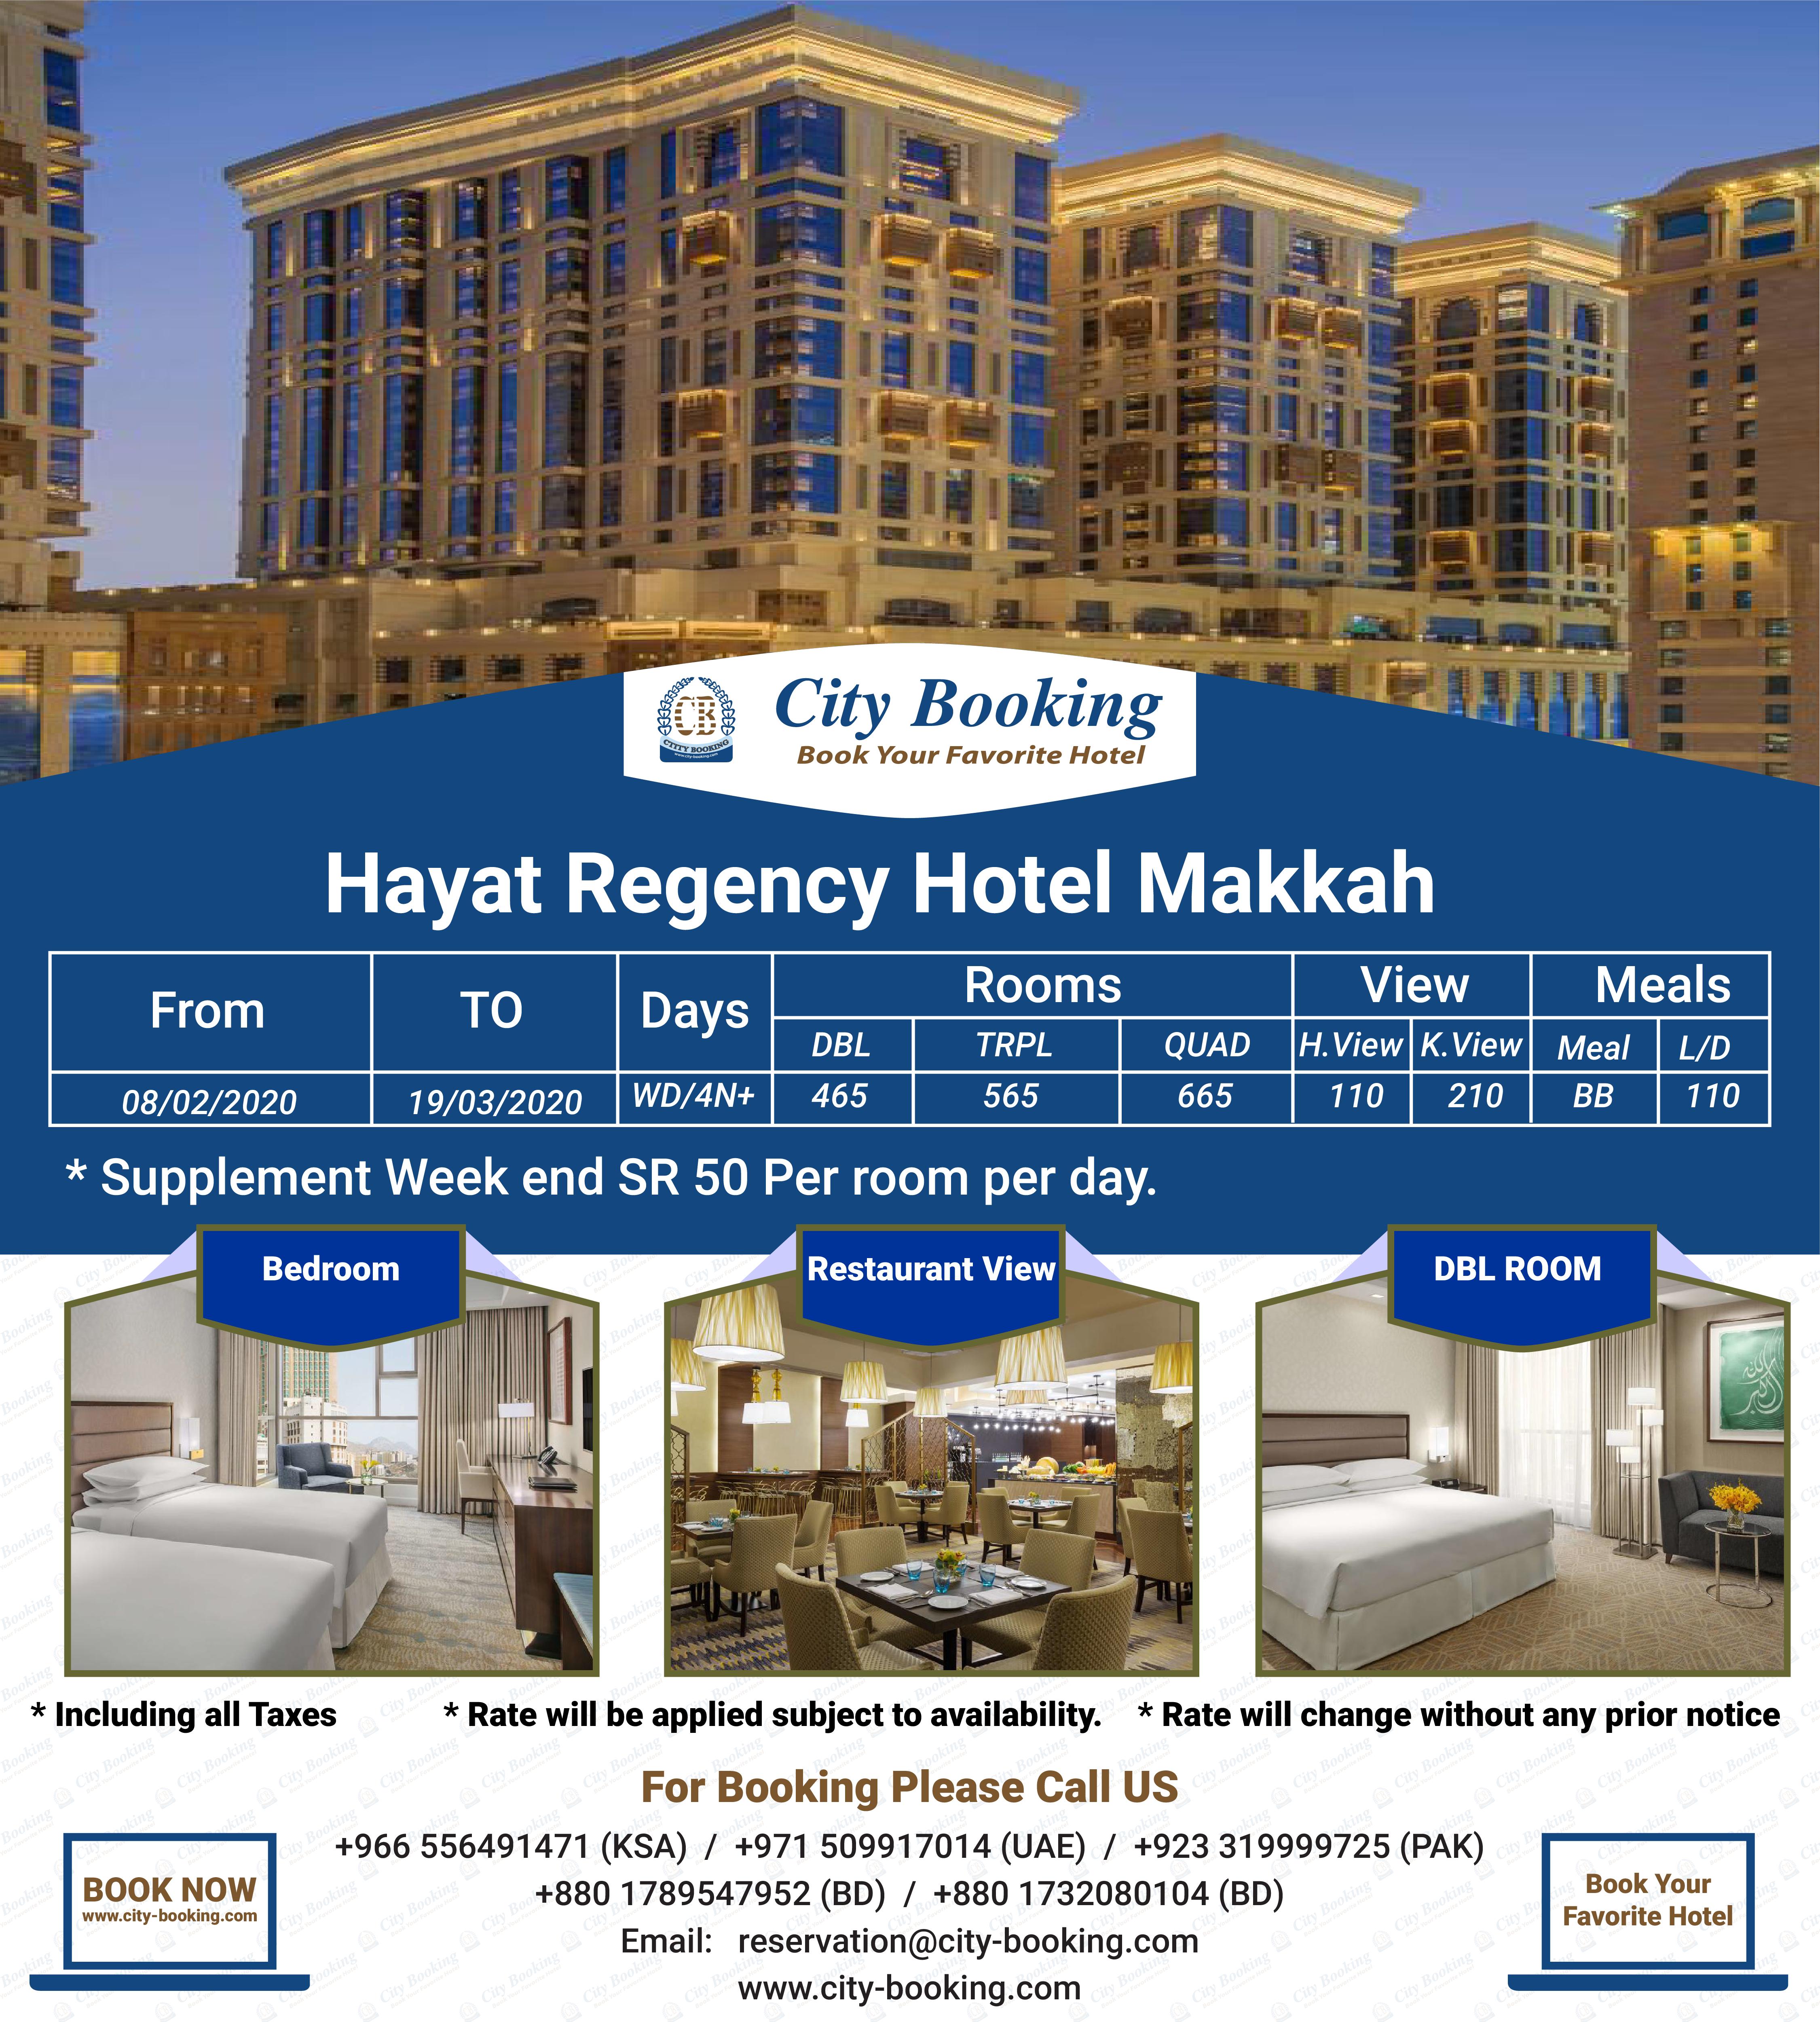 World Class Service At Jabal Omar Hyatt Regency Makkah Regency Hotel Hotel Hyatt Regency